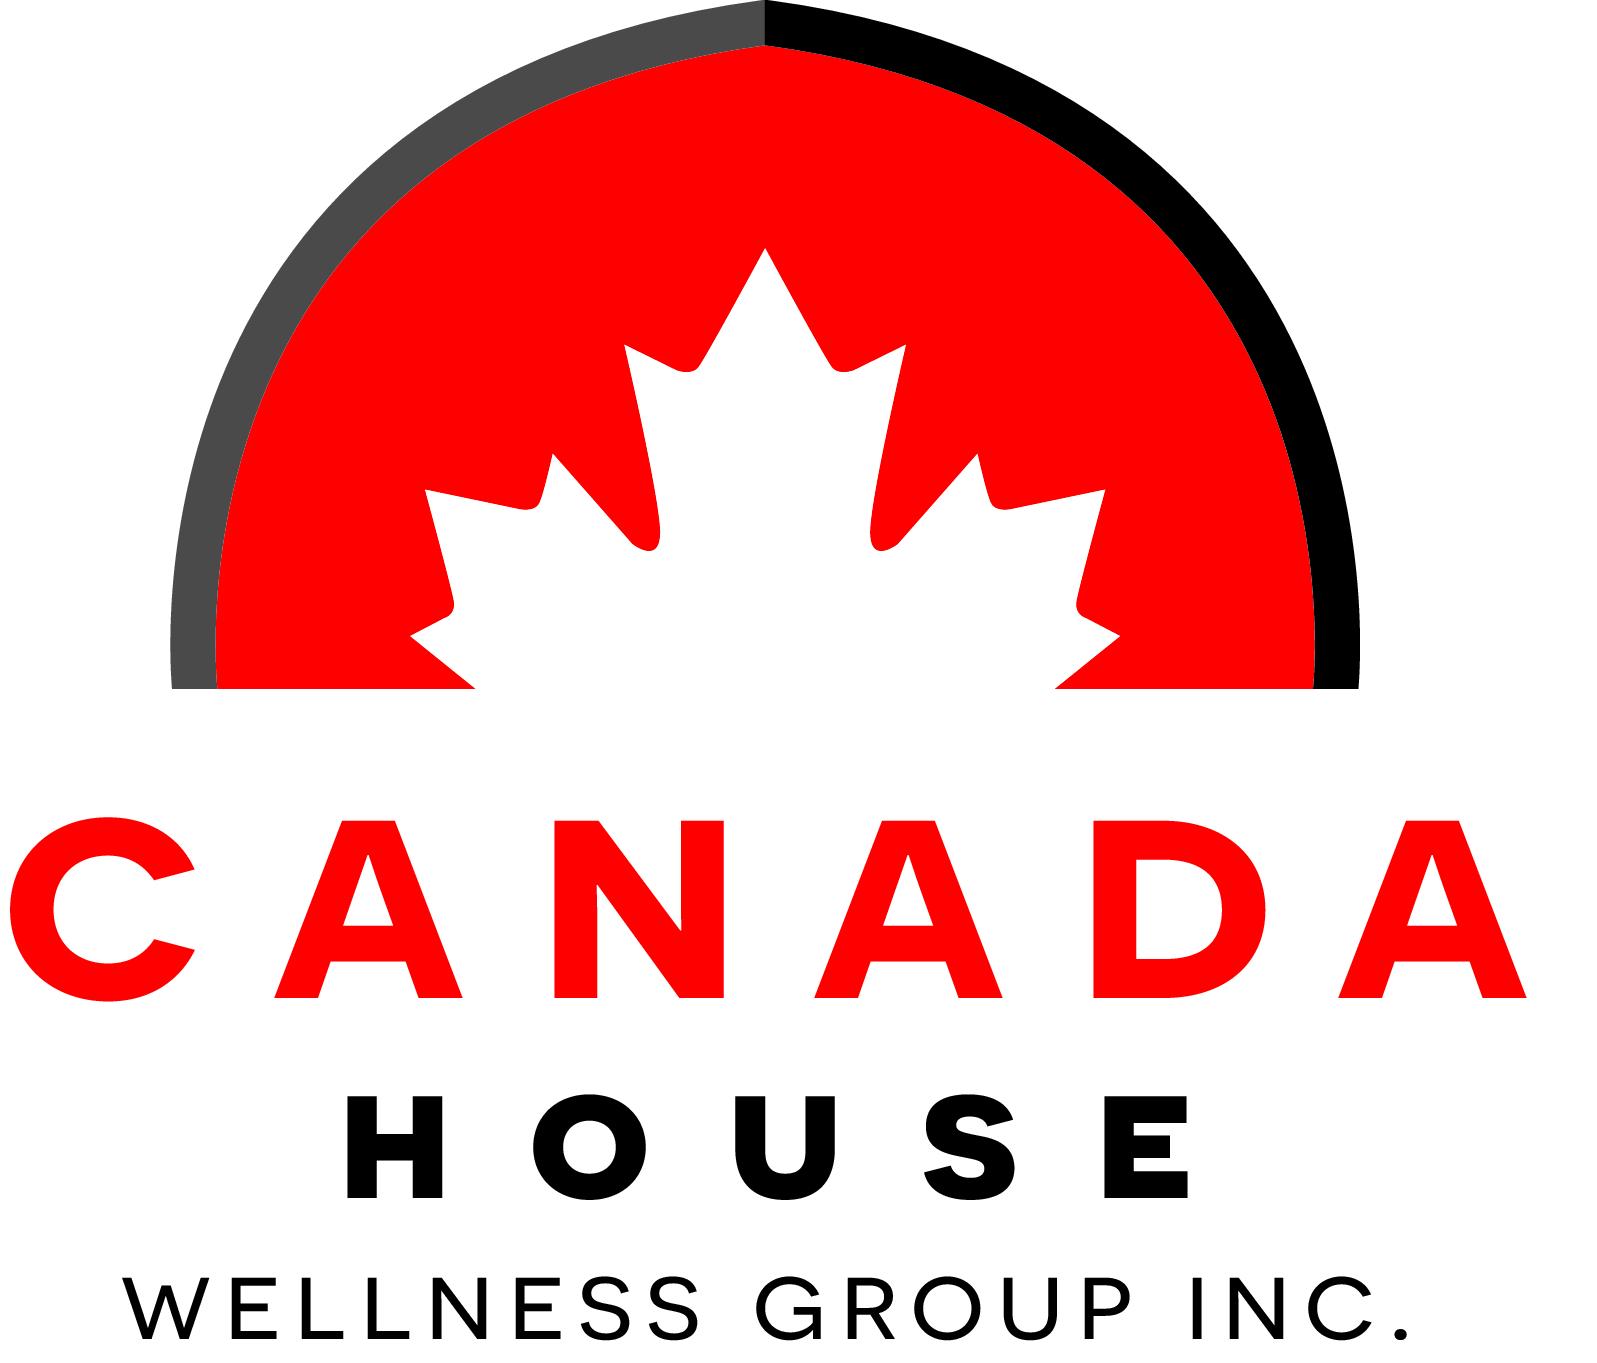 CanadaHouseLogoFull_Main.png